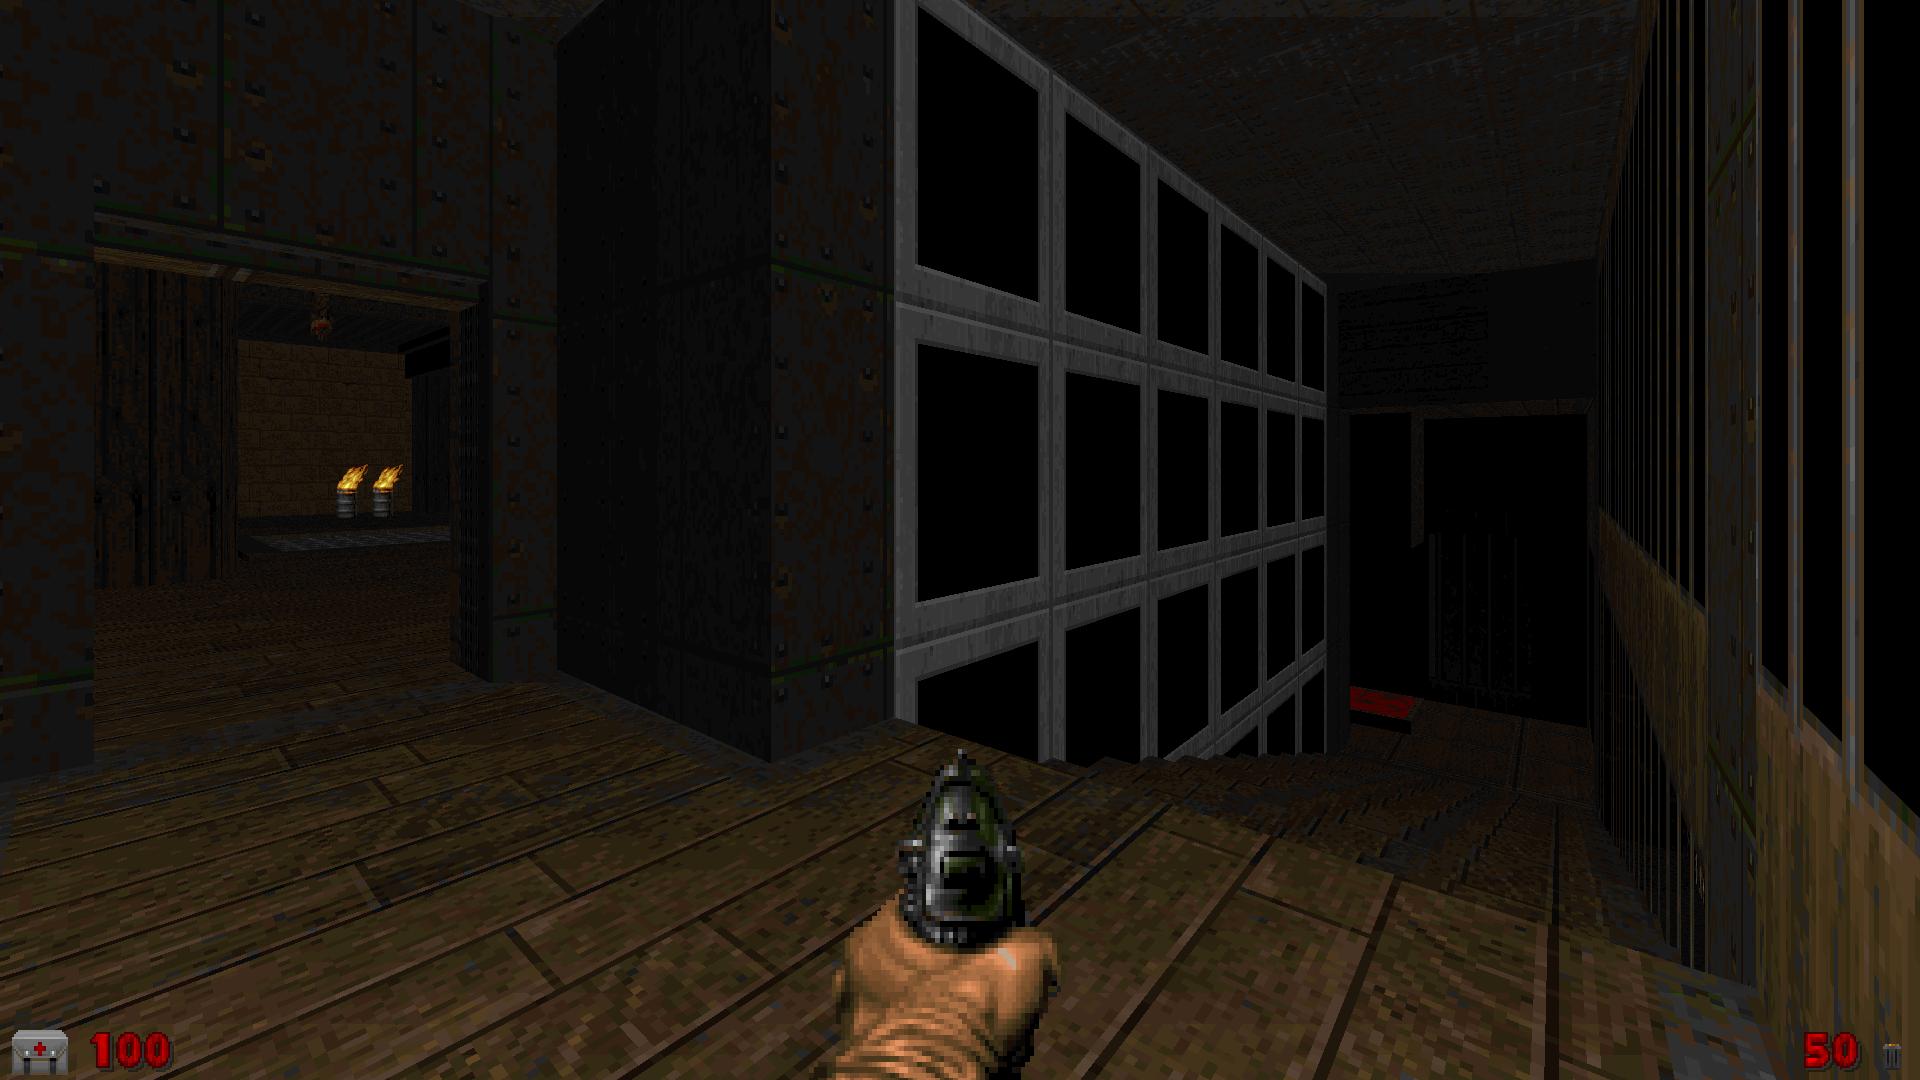 Screenshot_Doom_20200330_190124.png.c118dfc991f026f11a5b2b65a6764cfe.png